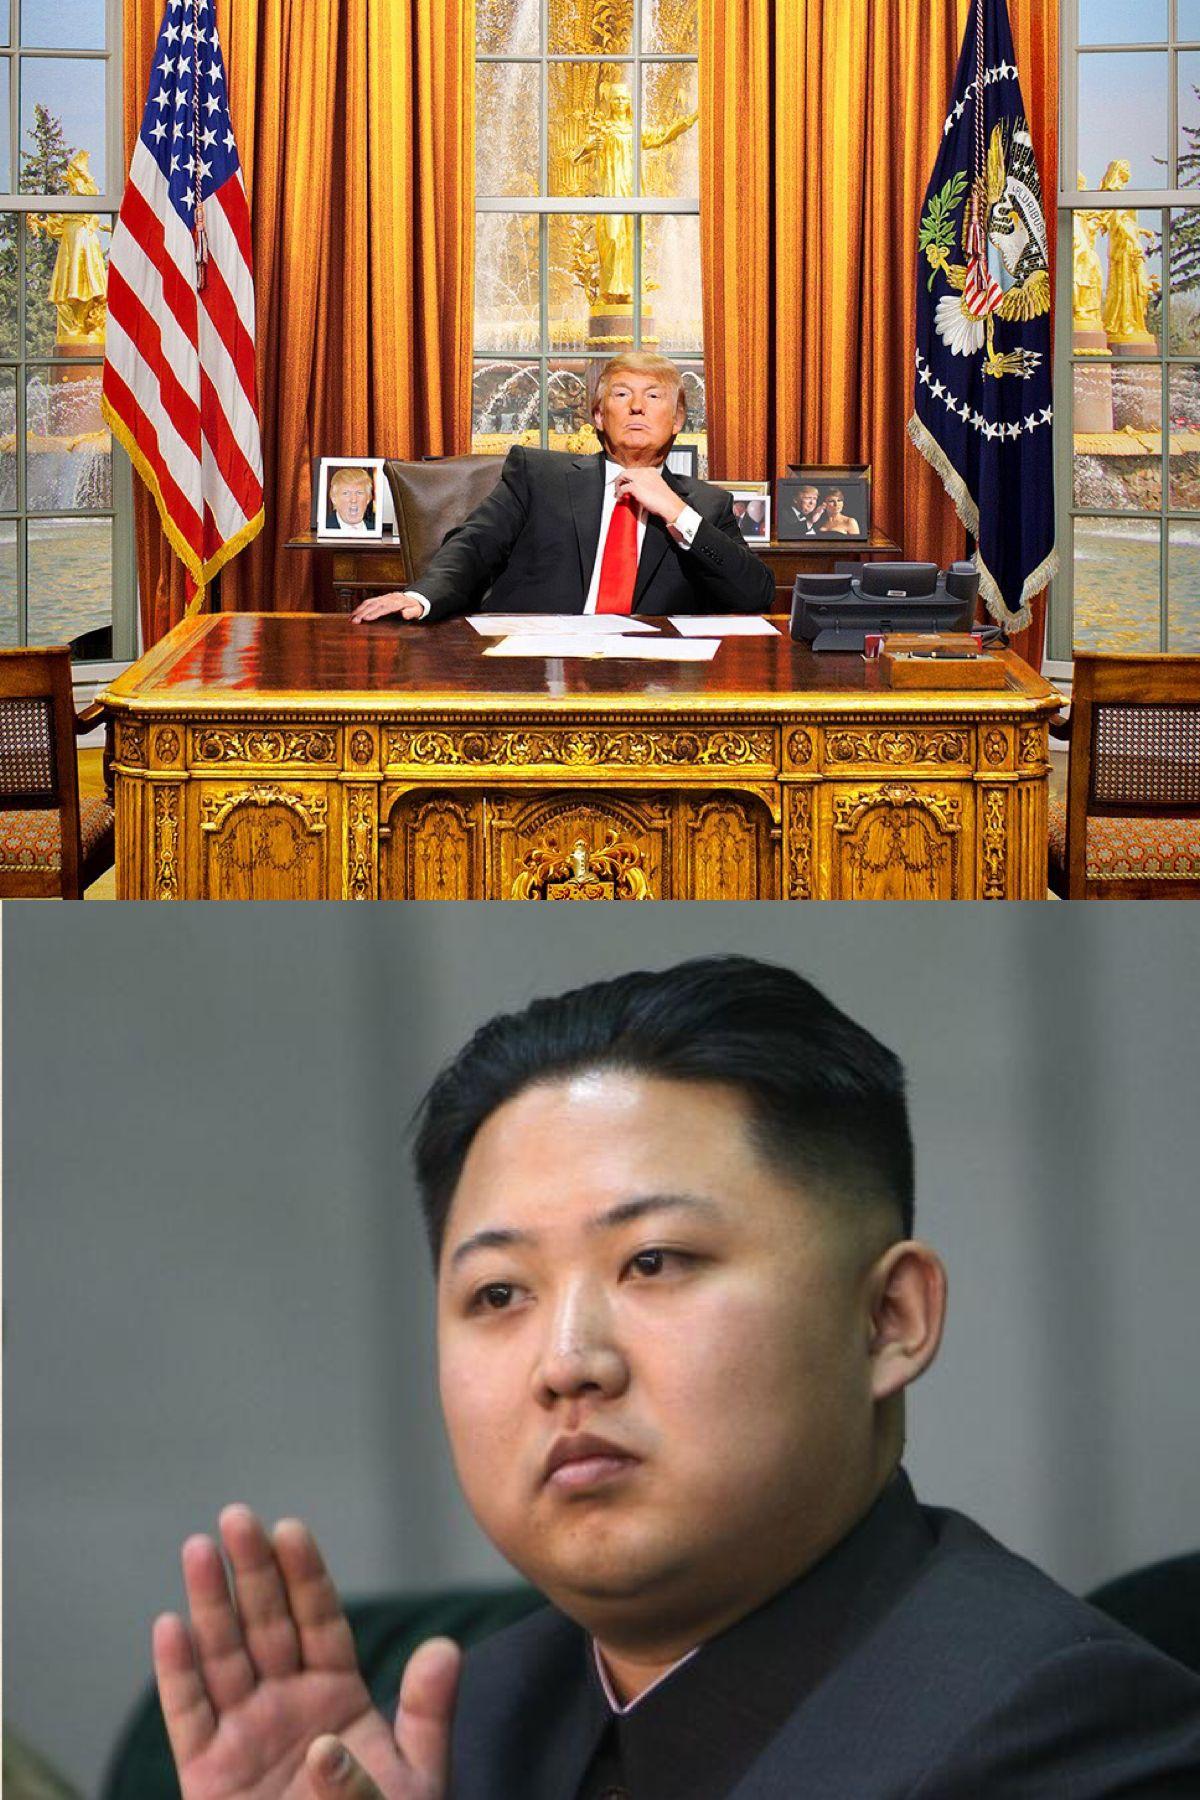 Trump Gop Kim Jong Un Blank Template Imgflip